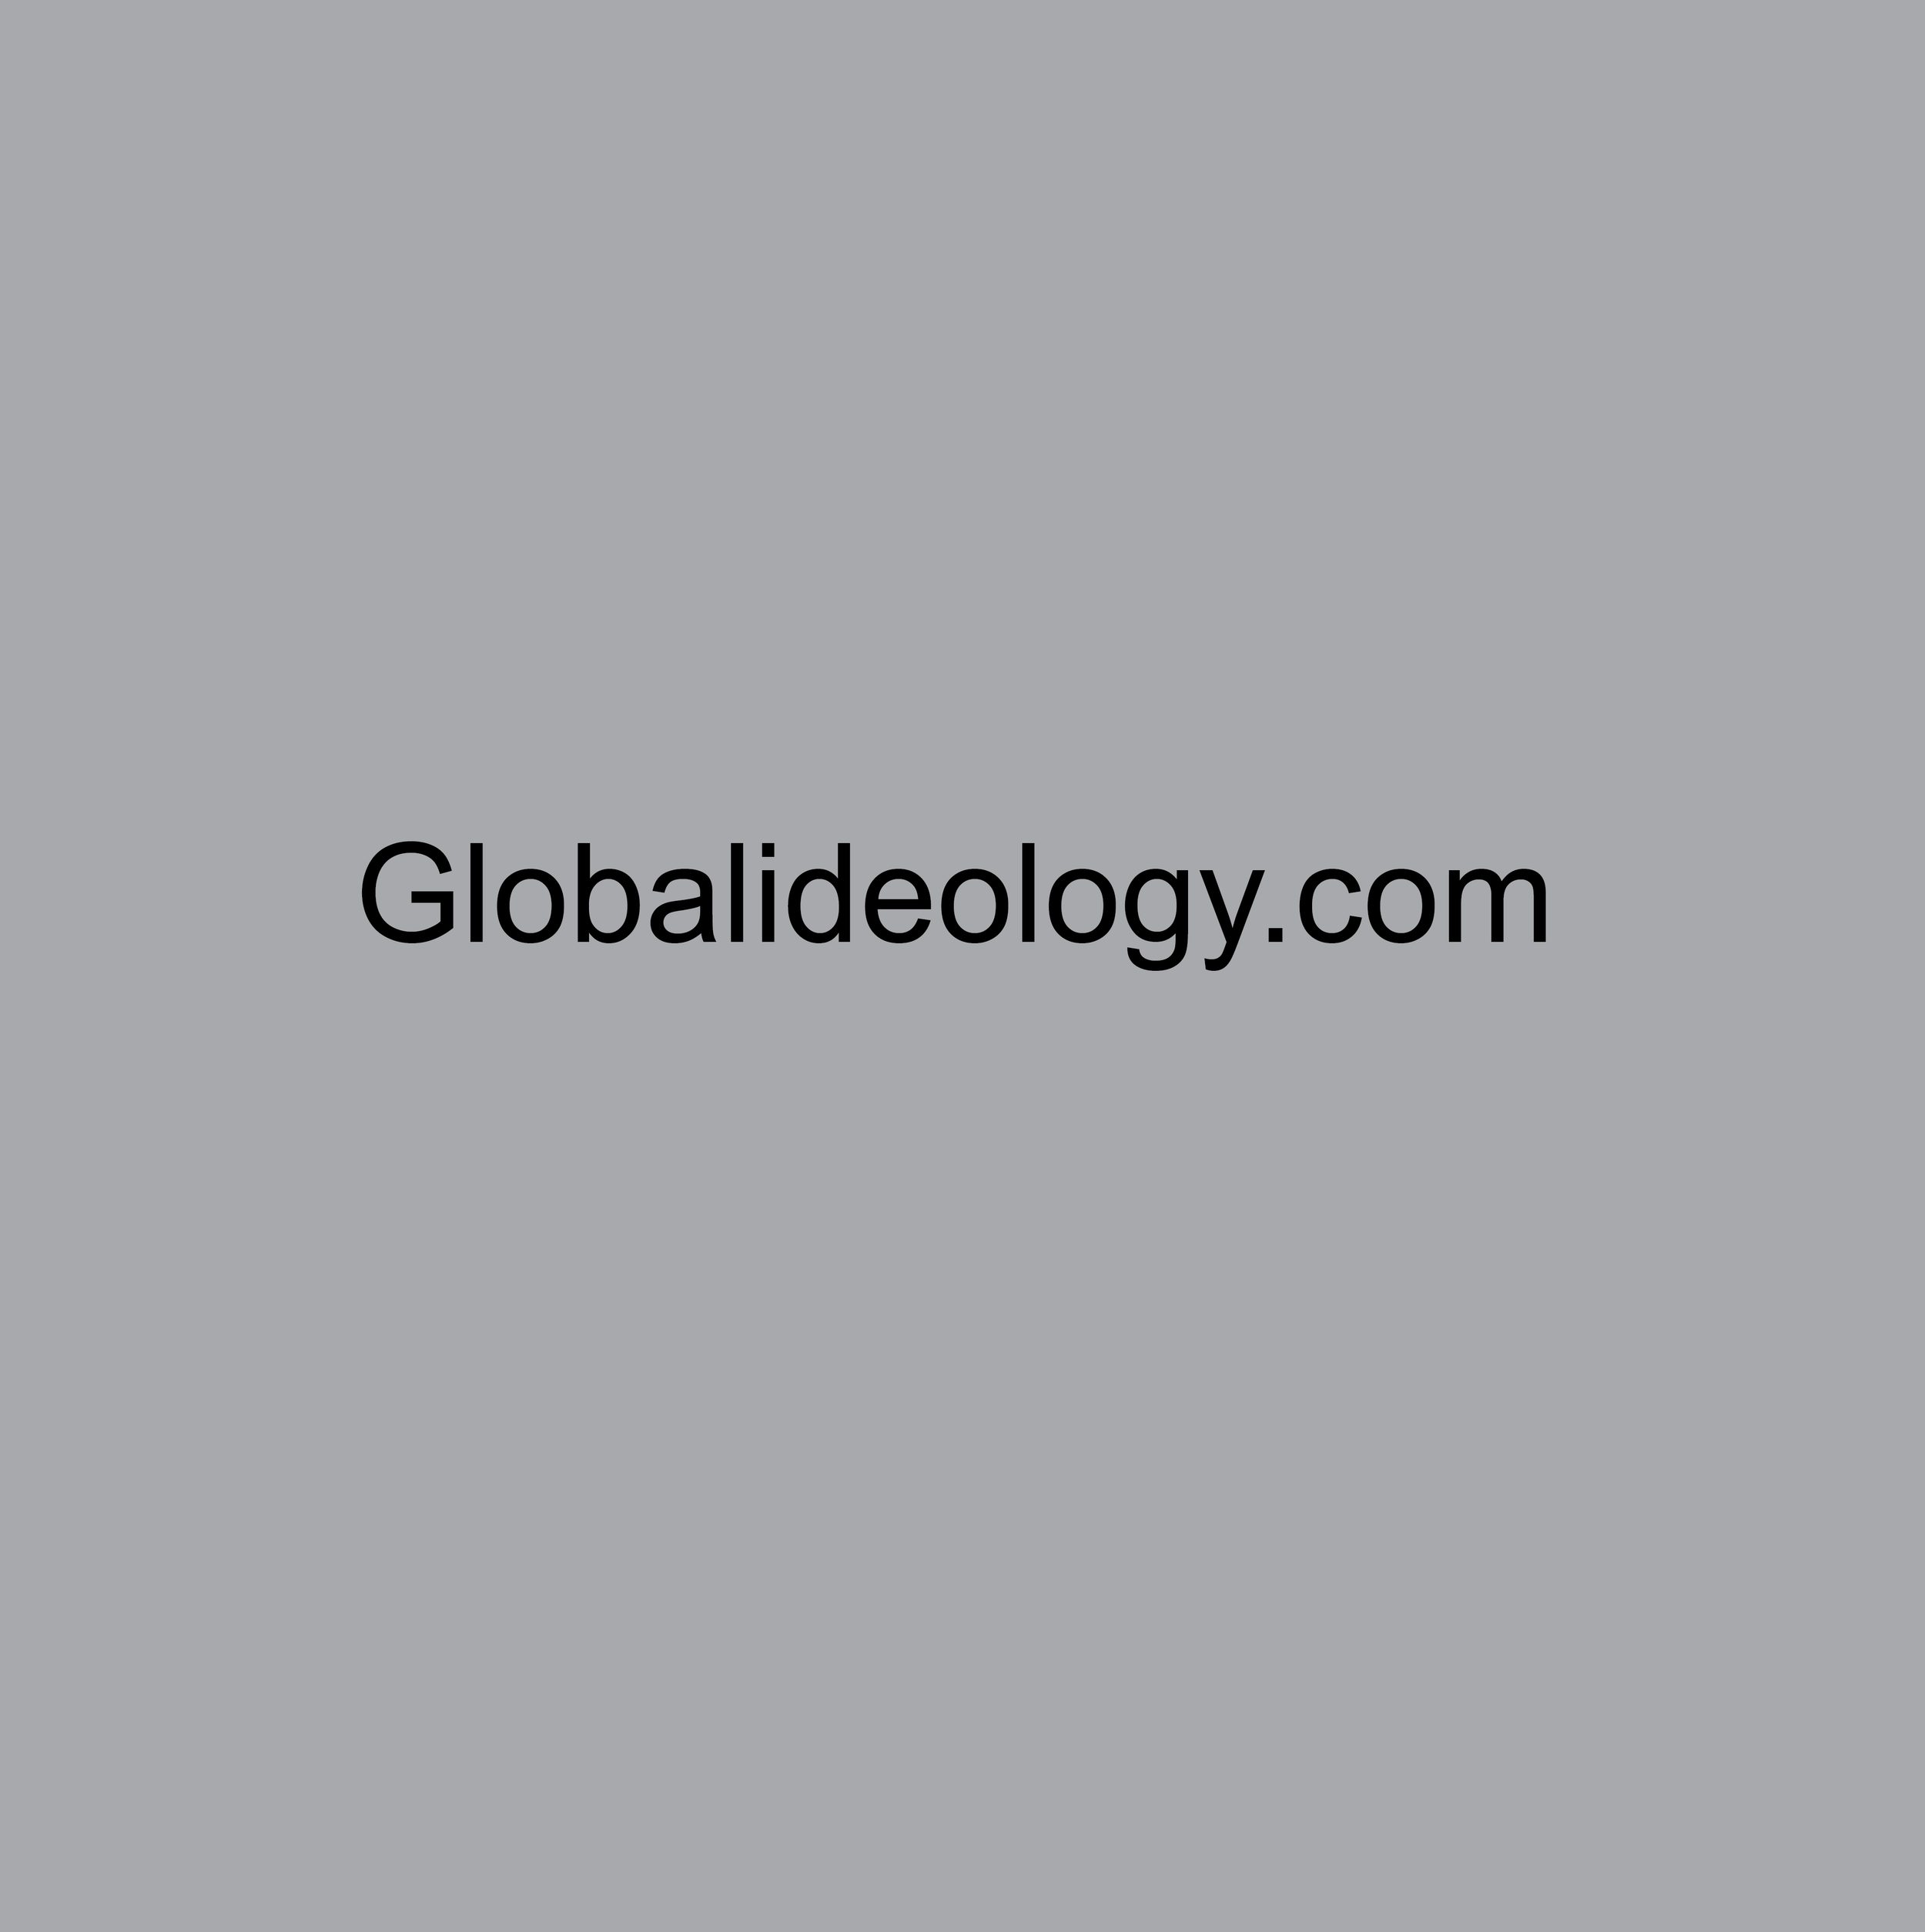 GLOBALIDEOLOGY.COM